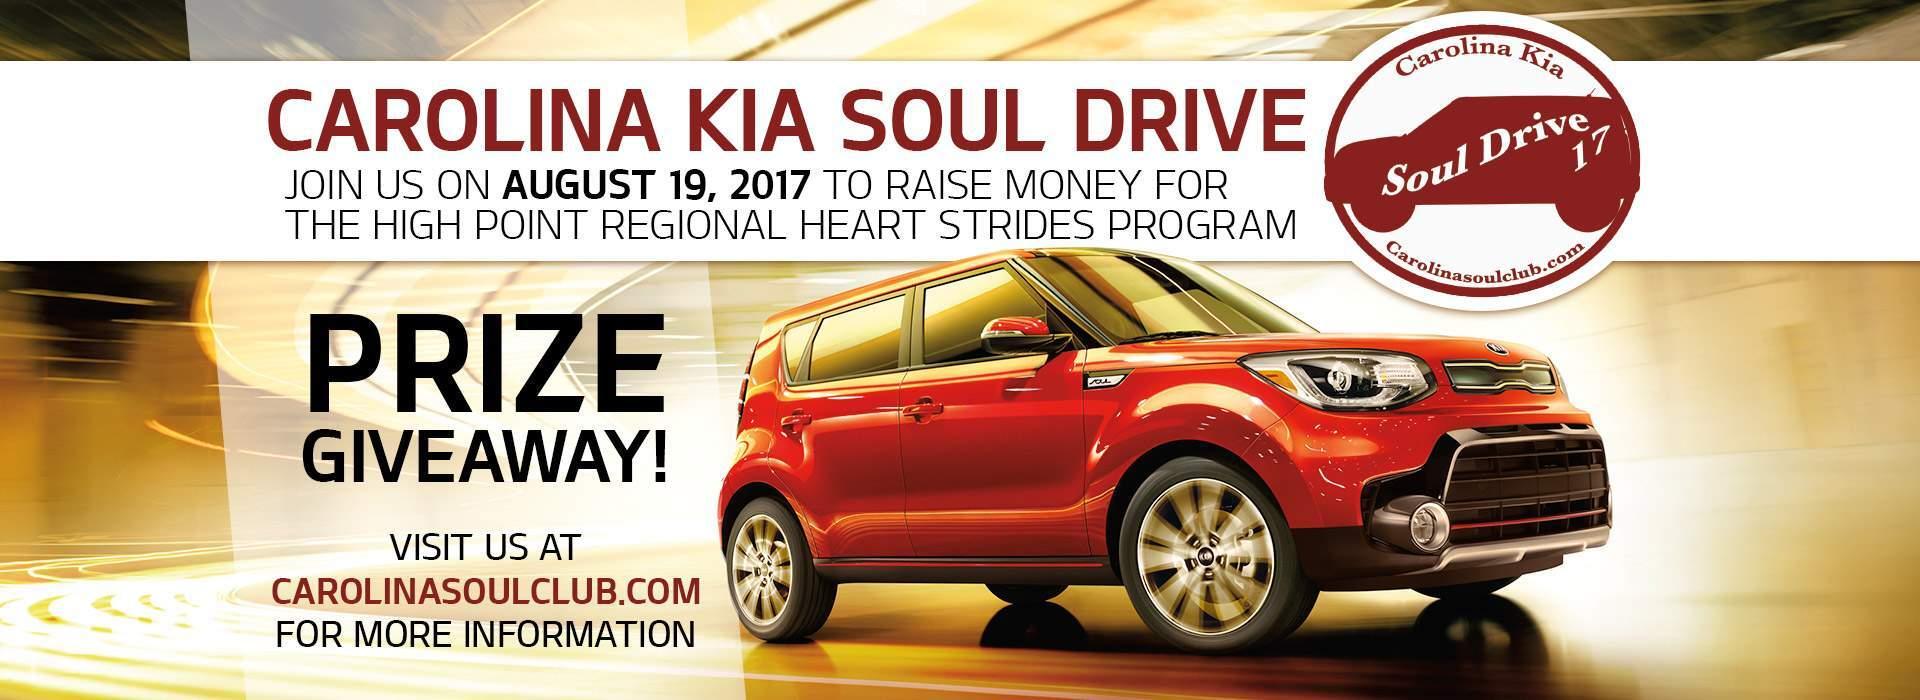 Kia Dealership High Point Nc Used Cars Carolina Kia Of